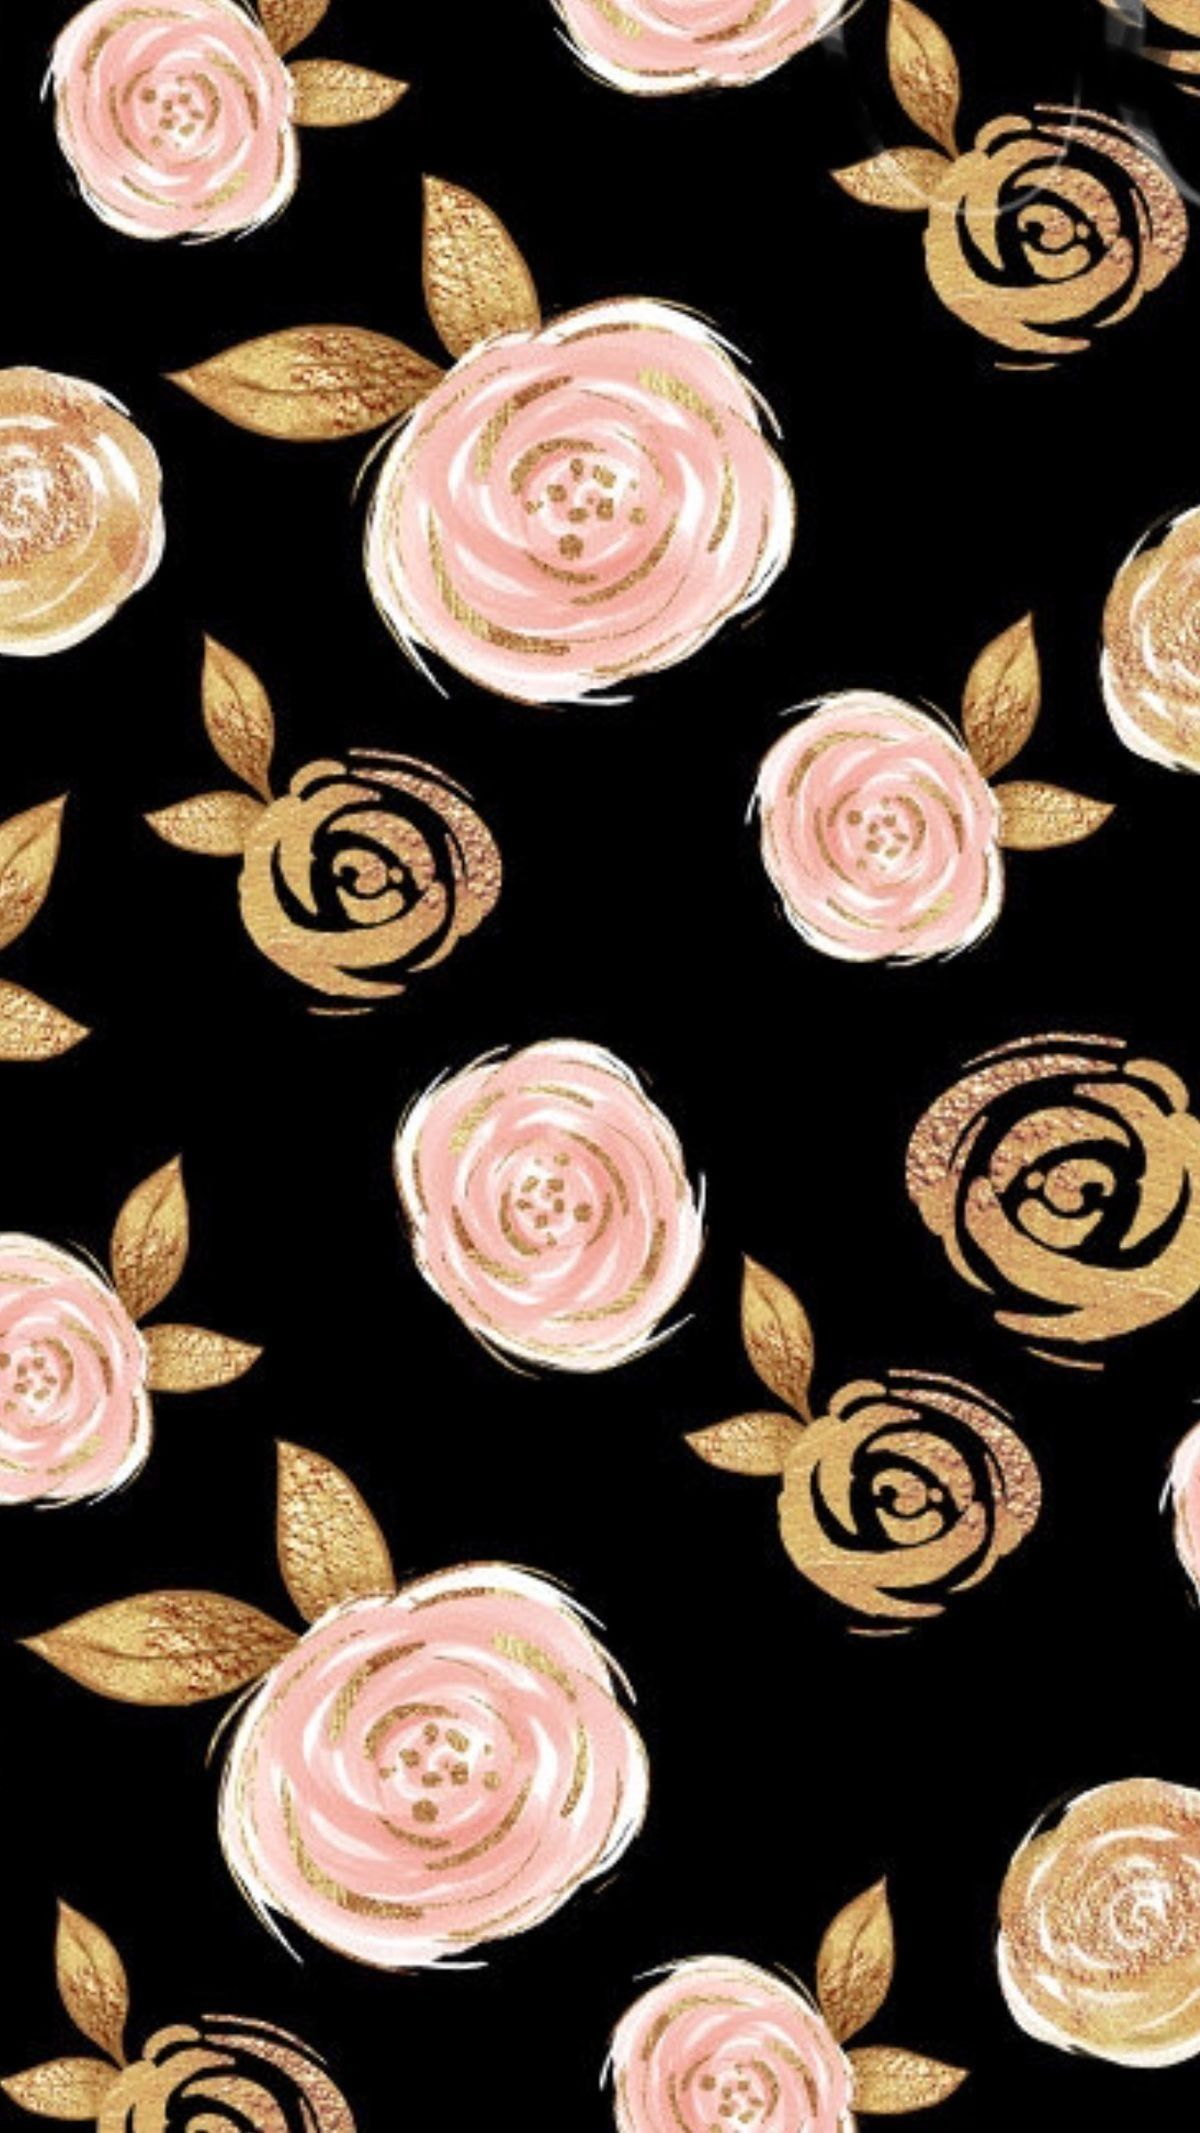 Iphonewallpaper Iphonebackground Wallpaper Background Roses Blackandgold Flowers Vintage Flowers Wallpaper Gold Wallpaper Background Rose Gold Wallpaper